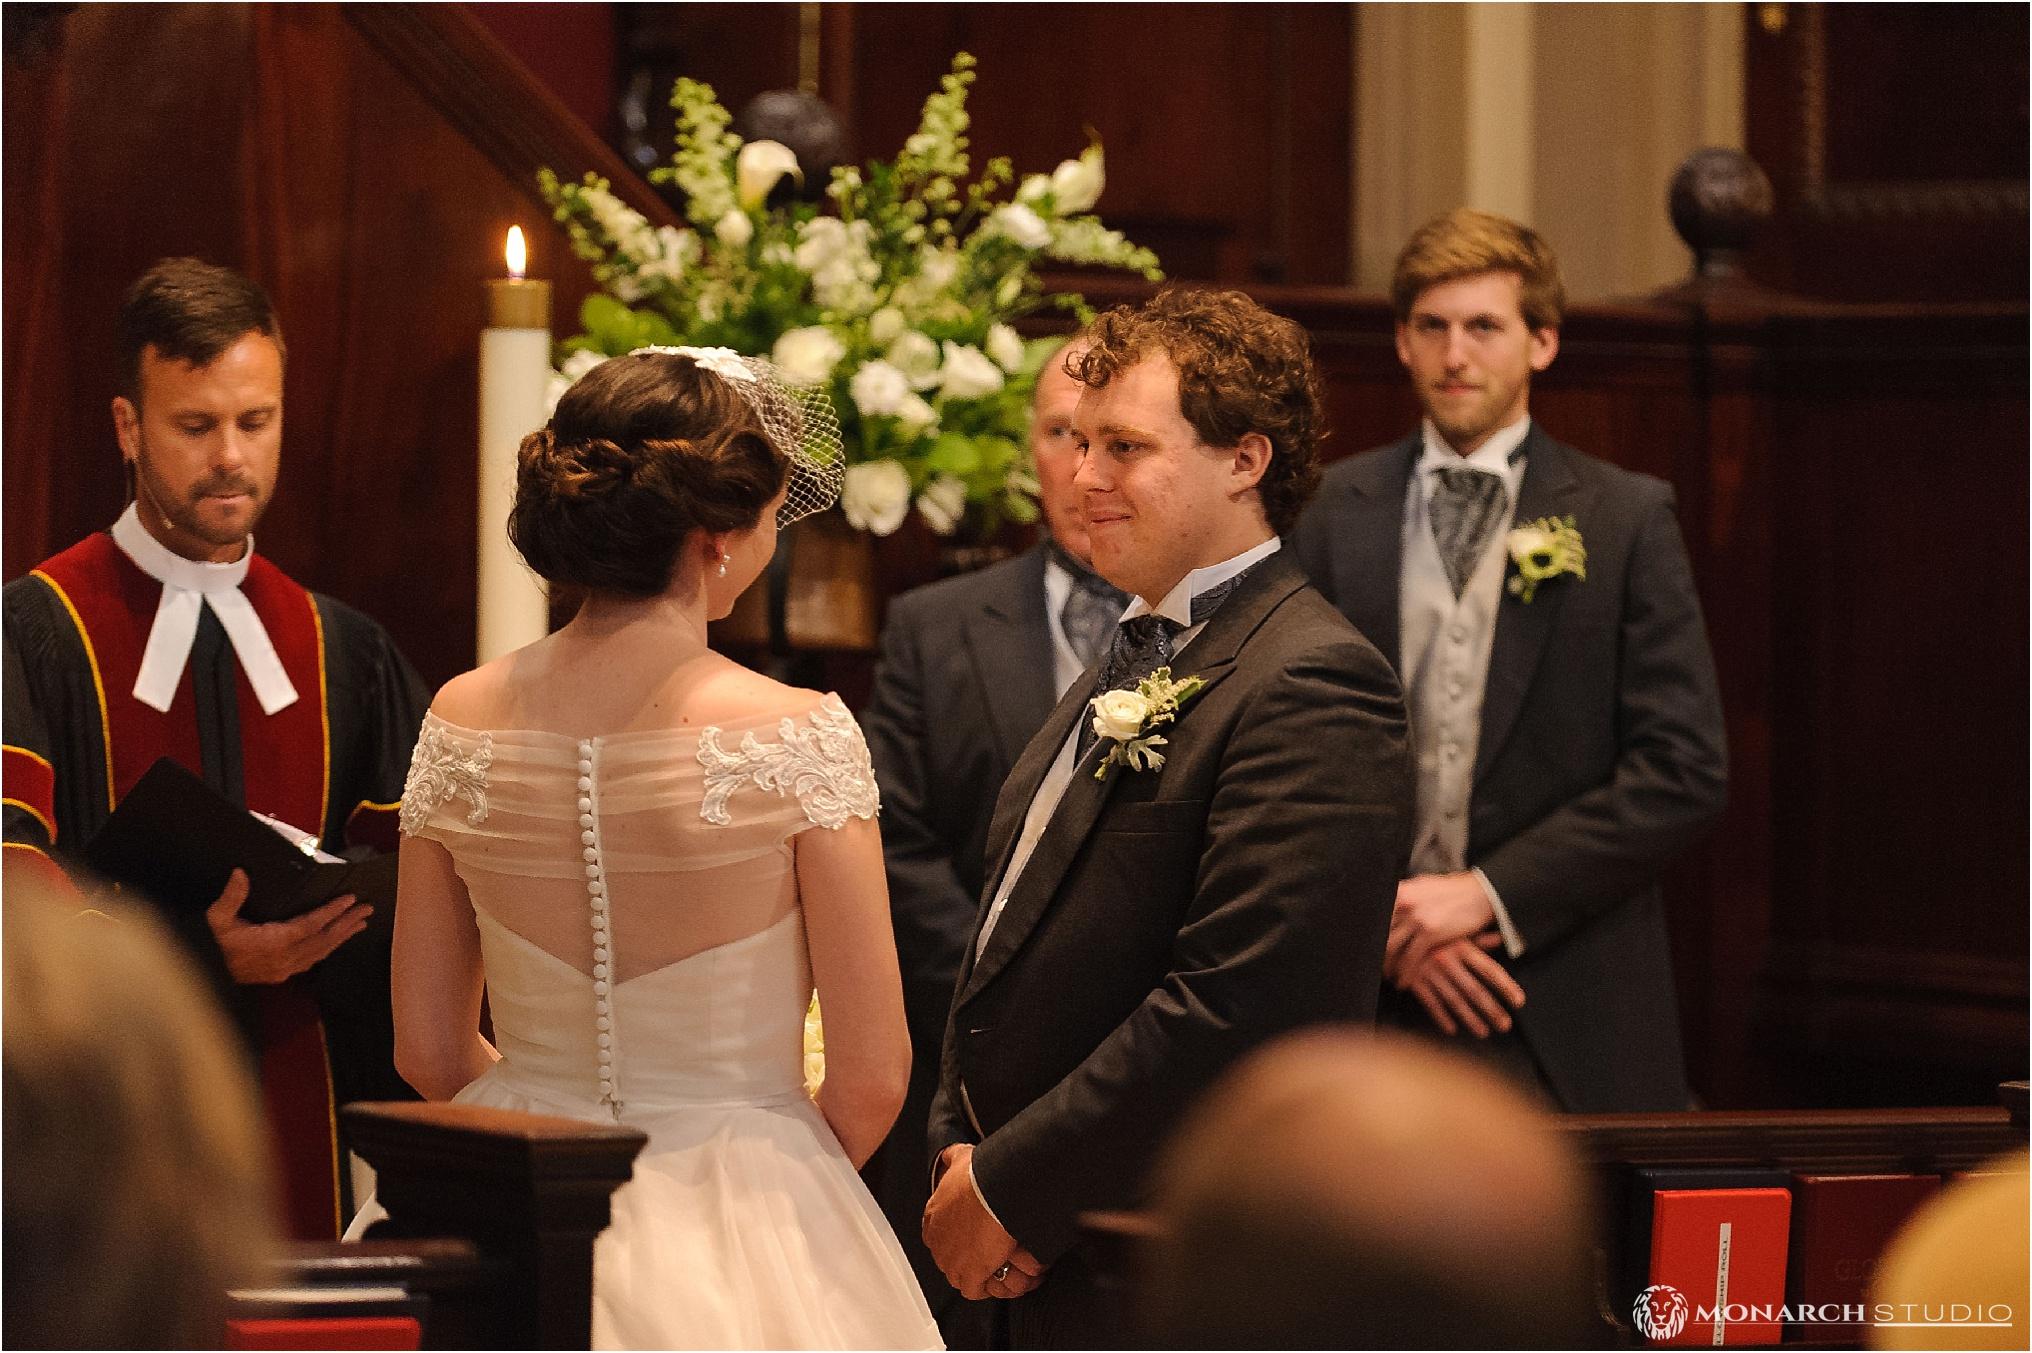 046-st-augustine-wedding-photographer-.jpg